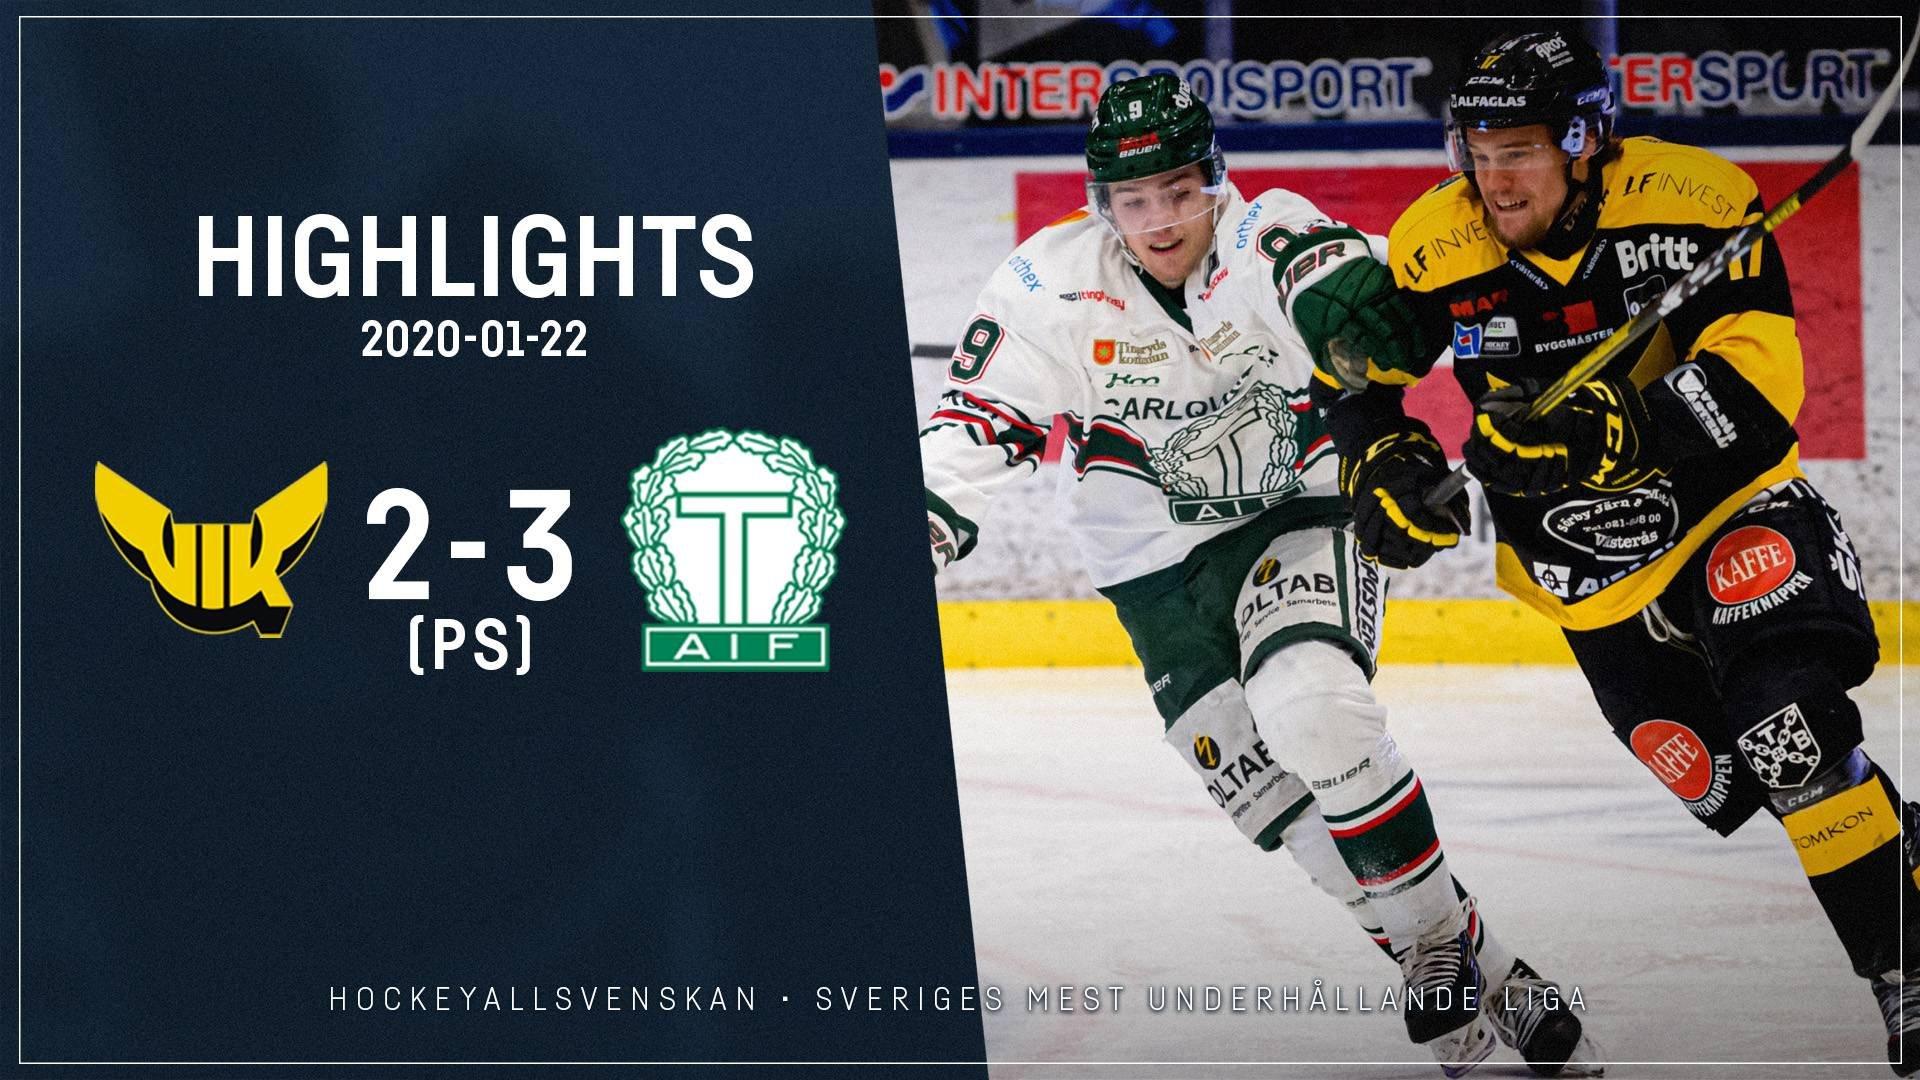 2020-01-22 Västerås - Tingsryd 2-3 (PS)